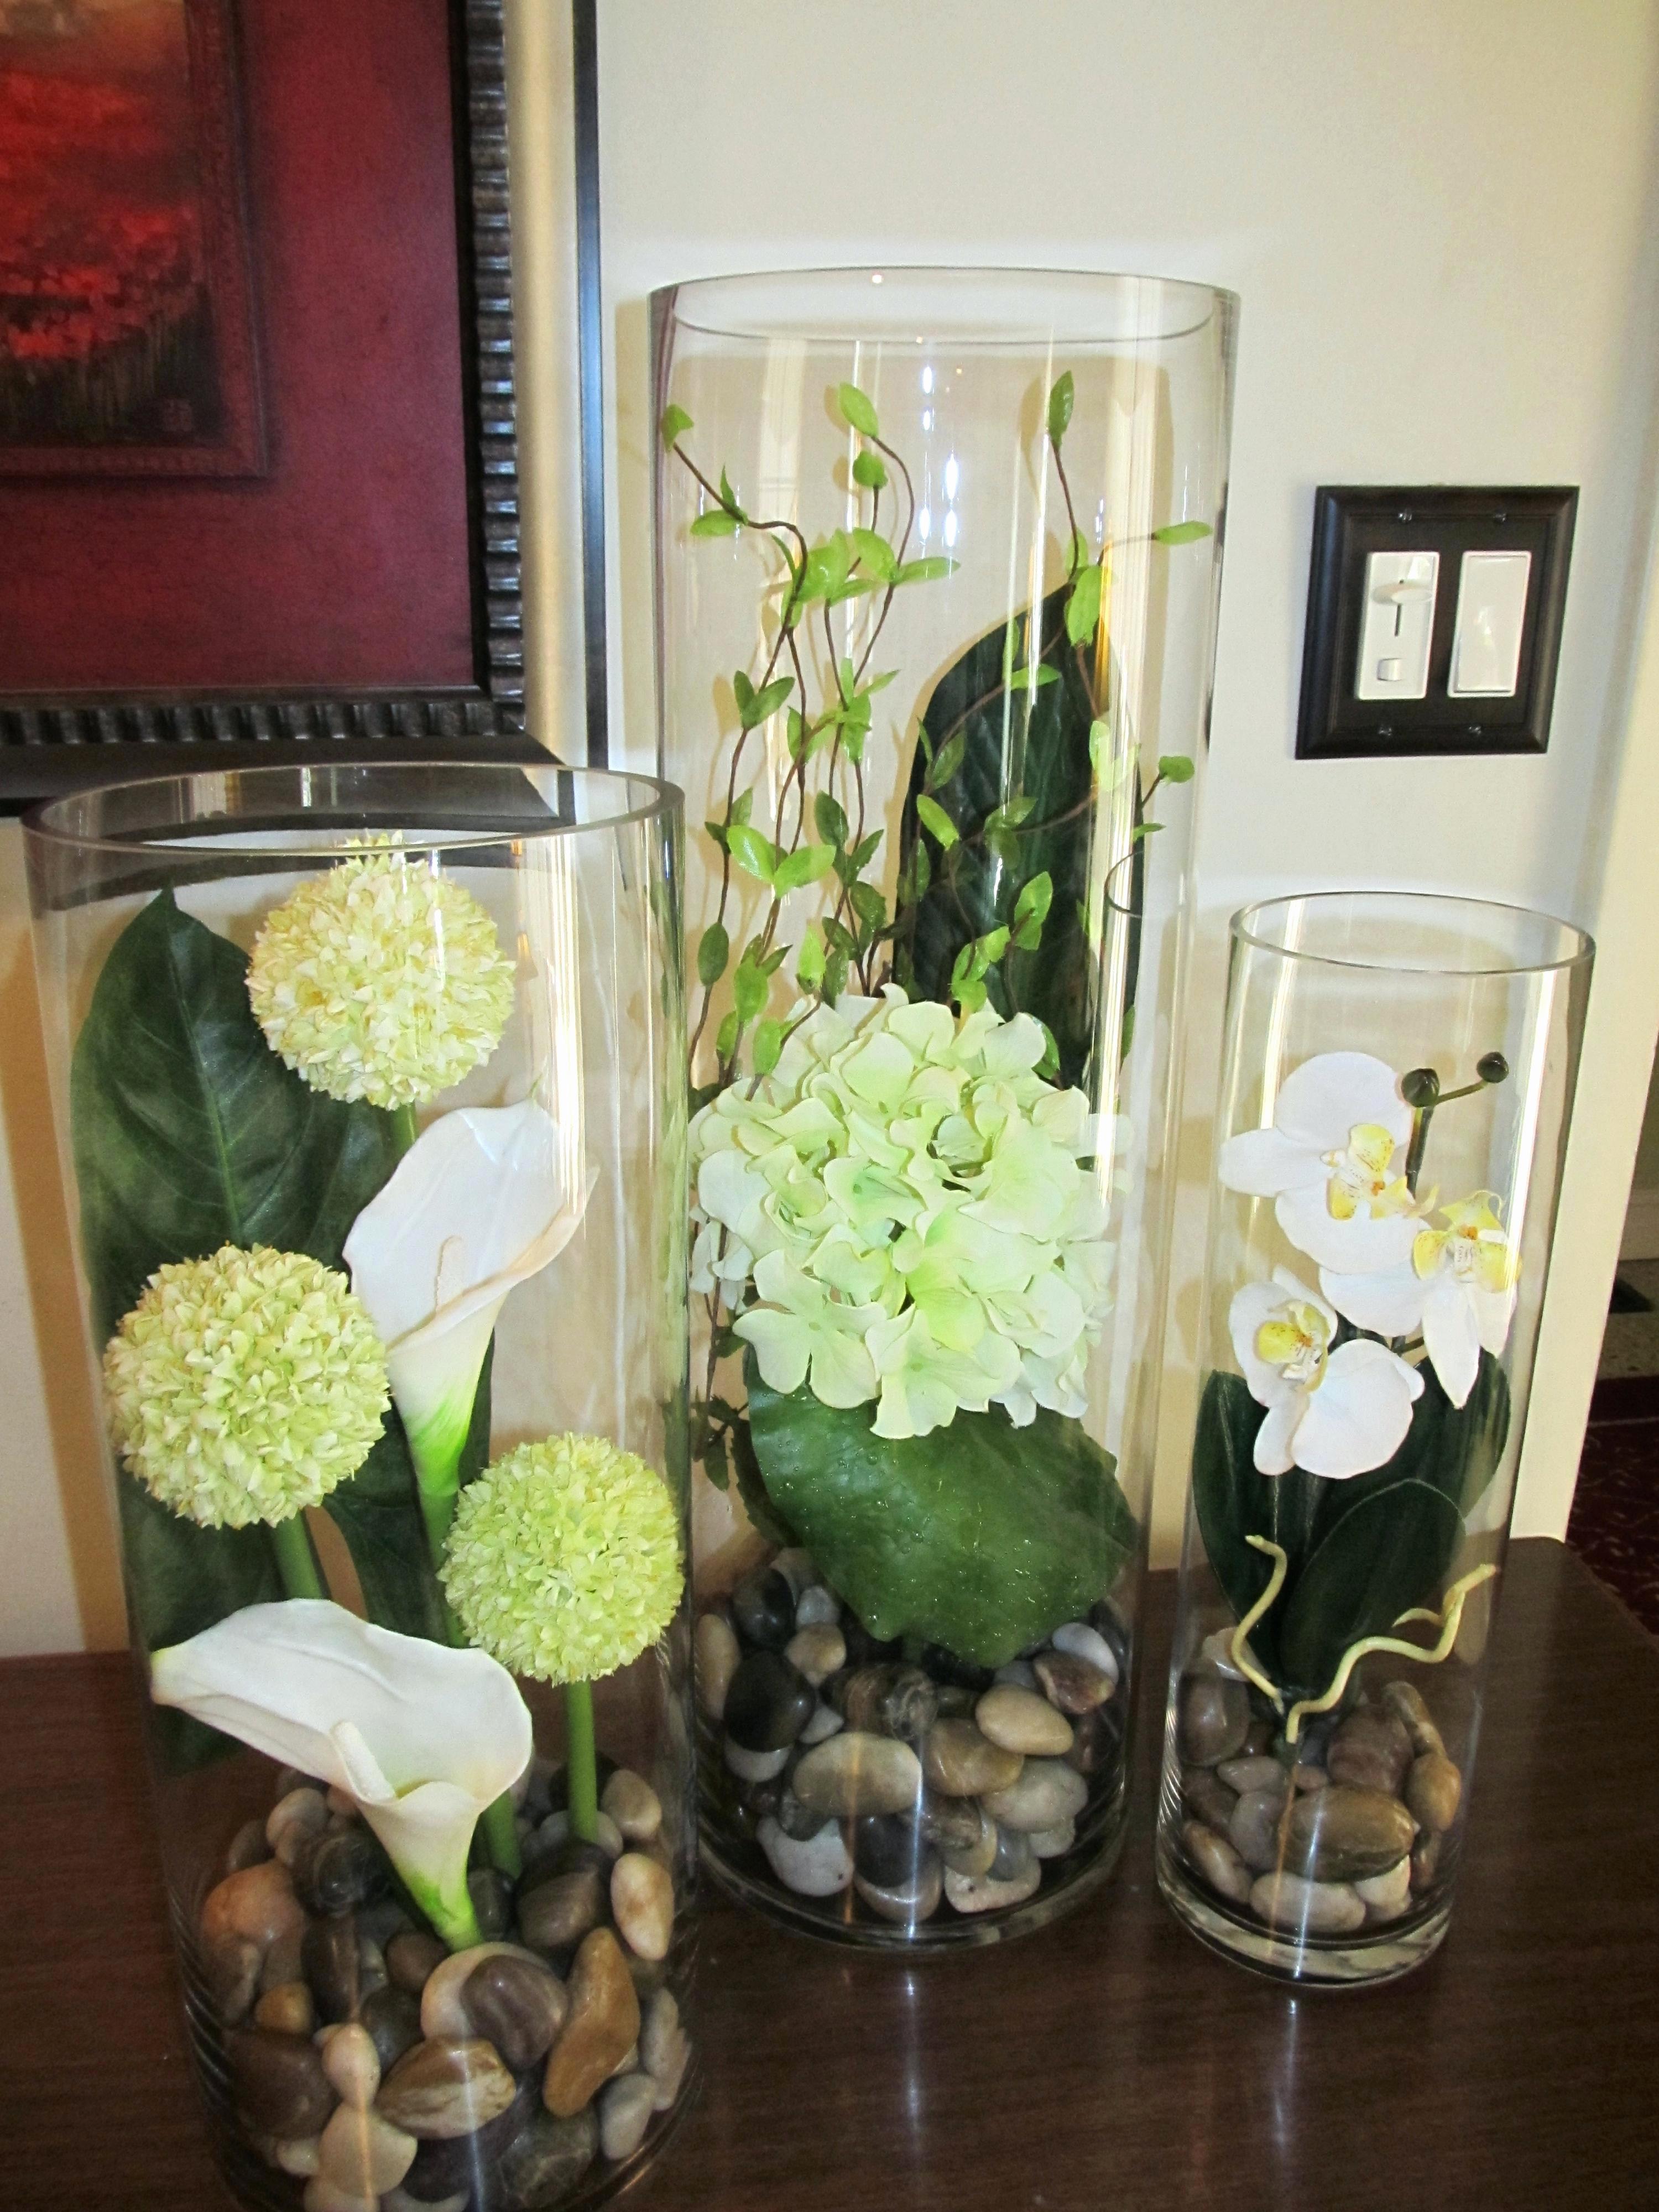 14 inch cylinder vases in bulk of 10 beautiful cylinder glass vases in bulk bogekompresorturkiye com for round glass vases for centerpieces uk round designs